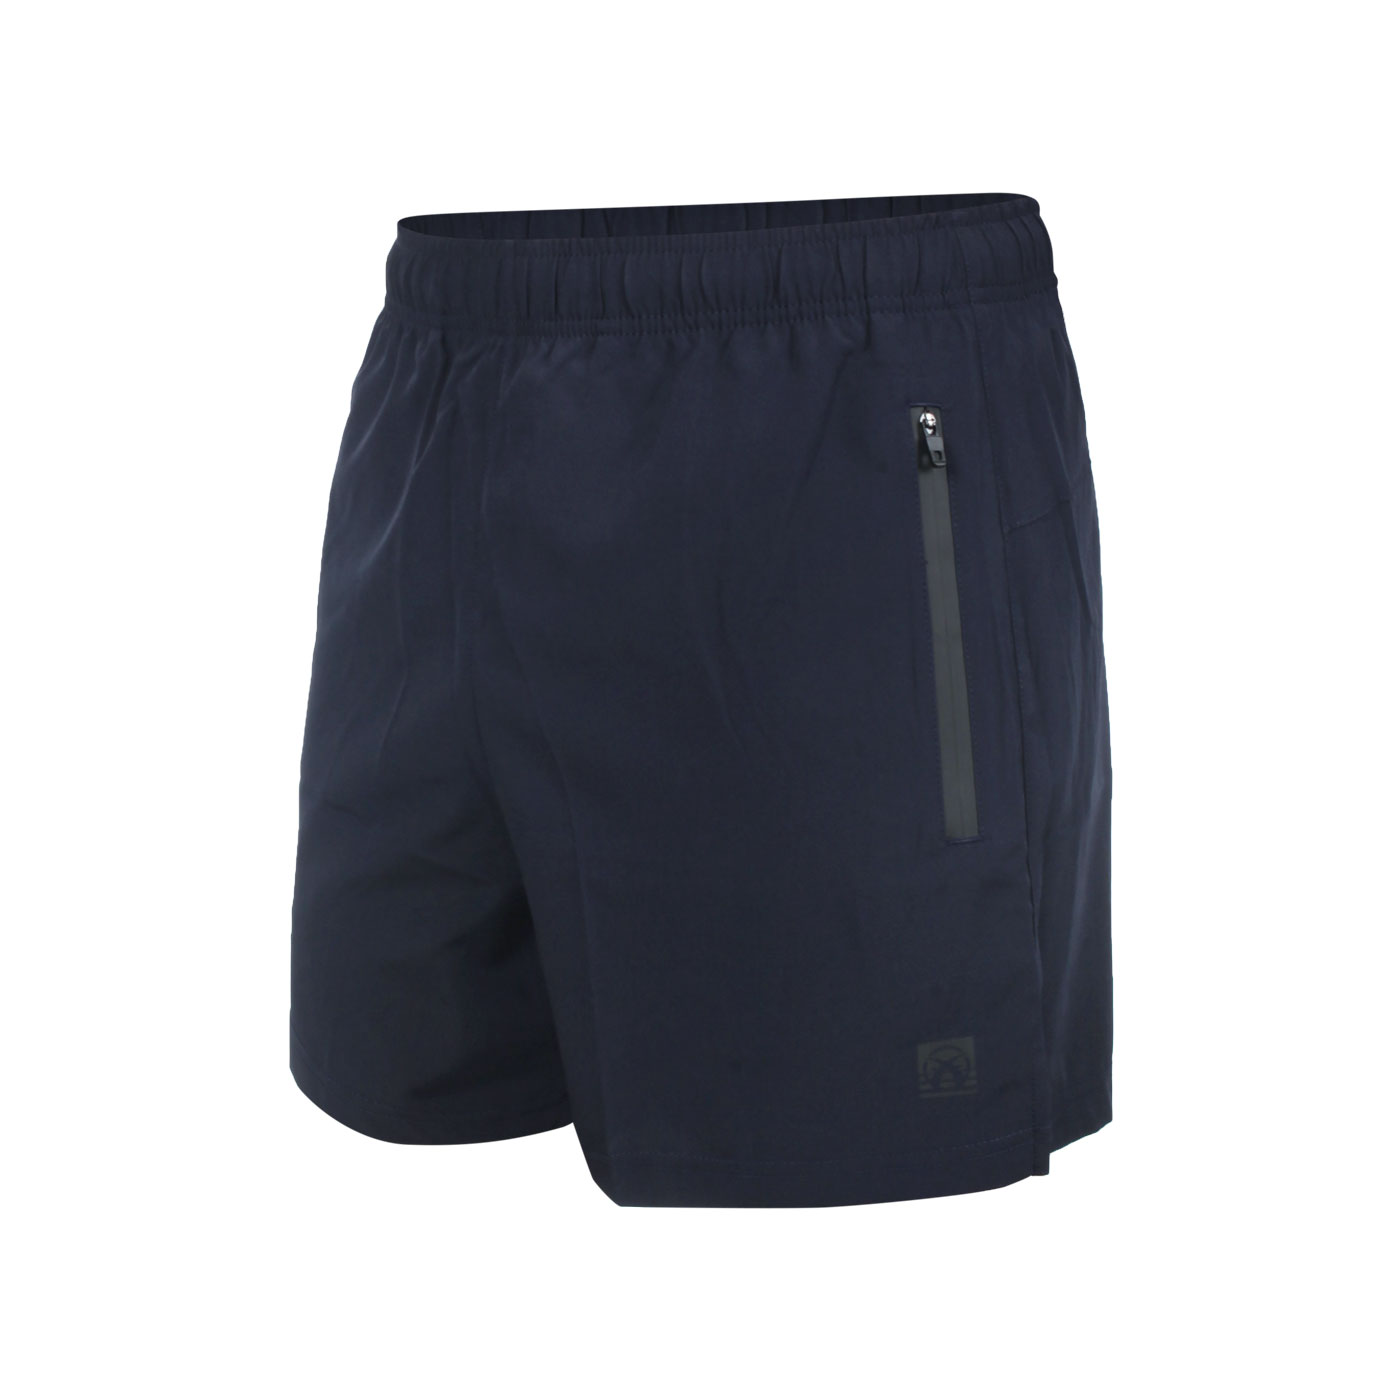 FIRESTAR 男款彈性平織短褲 C1711-93